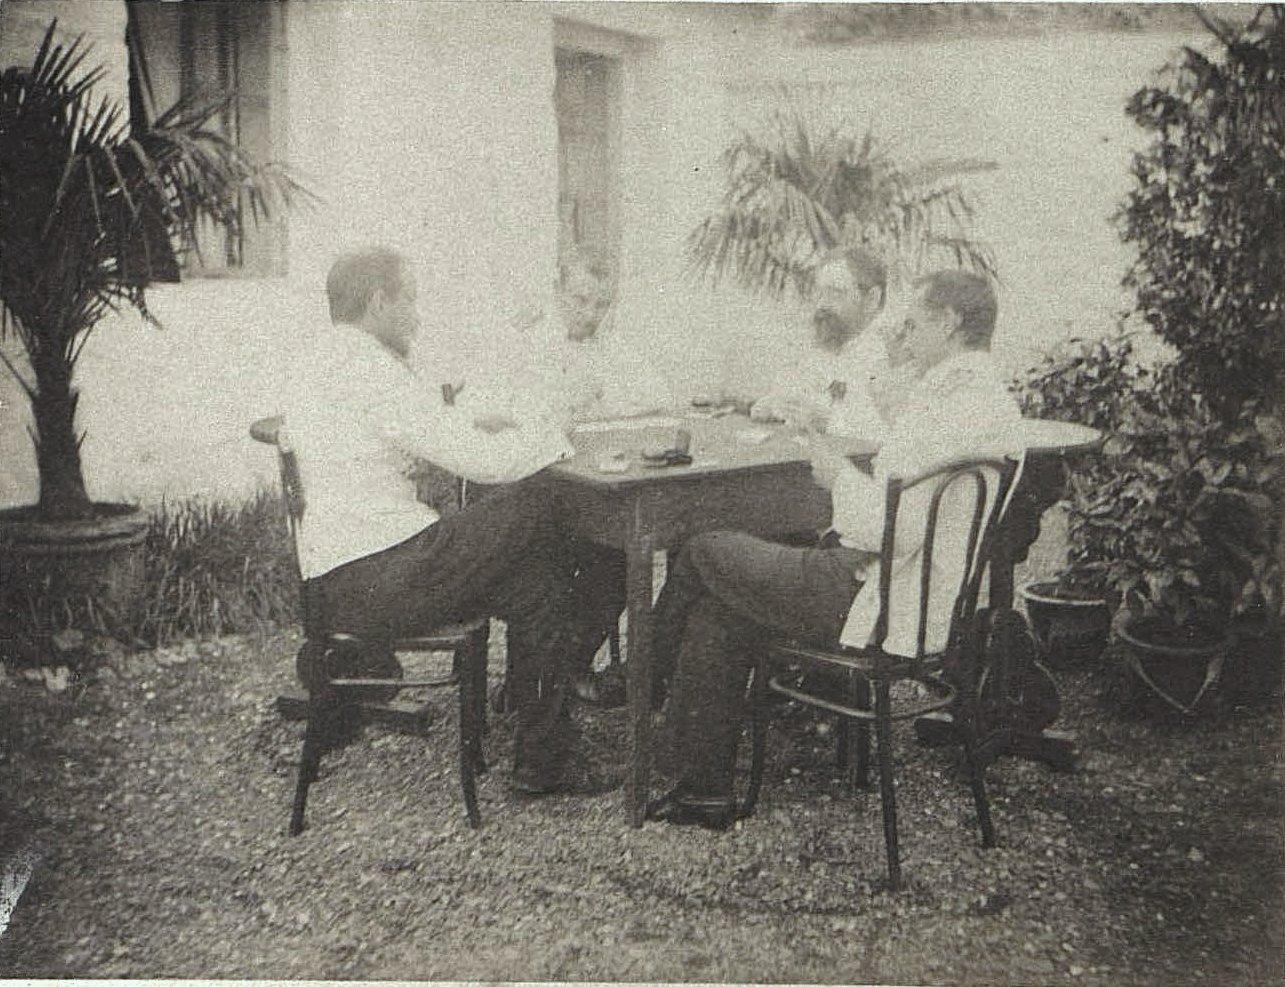 1898. Китай, г. Талиенван. Вист в саду. Август